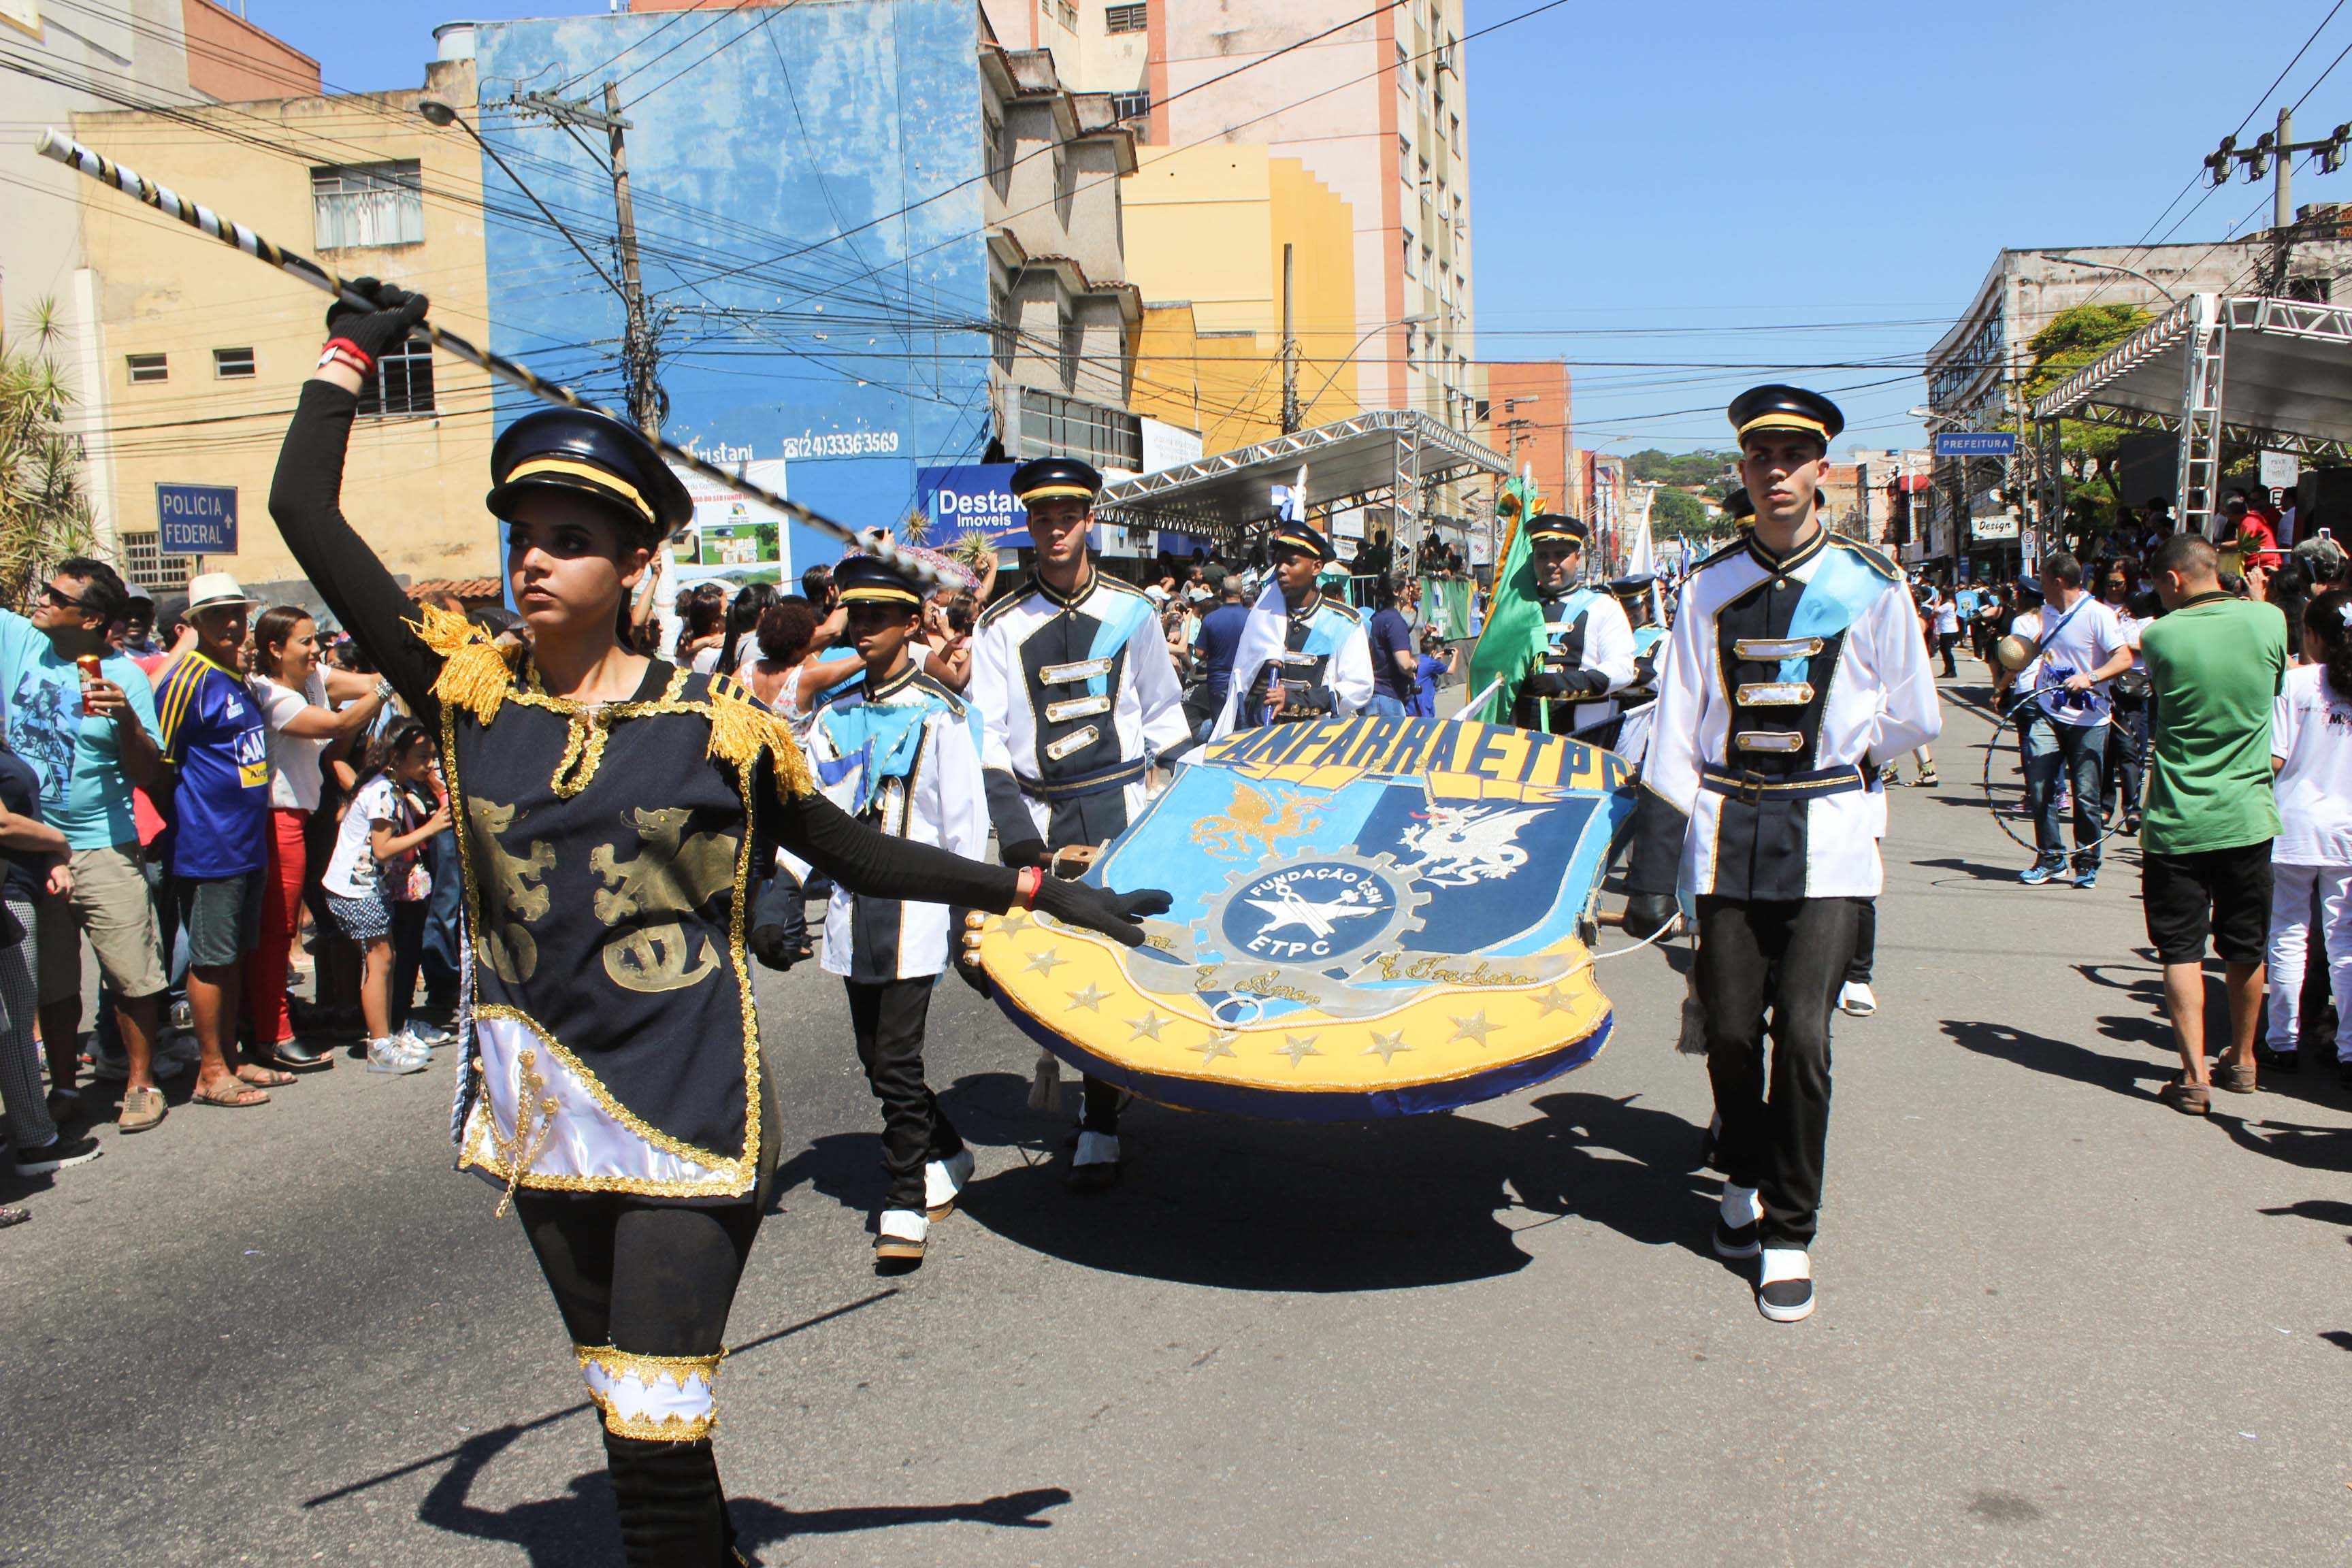 Desfile-55-min